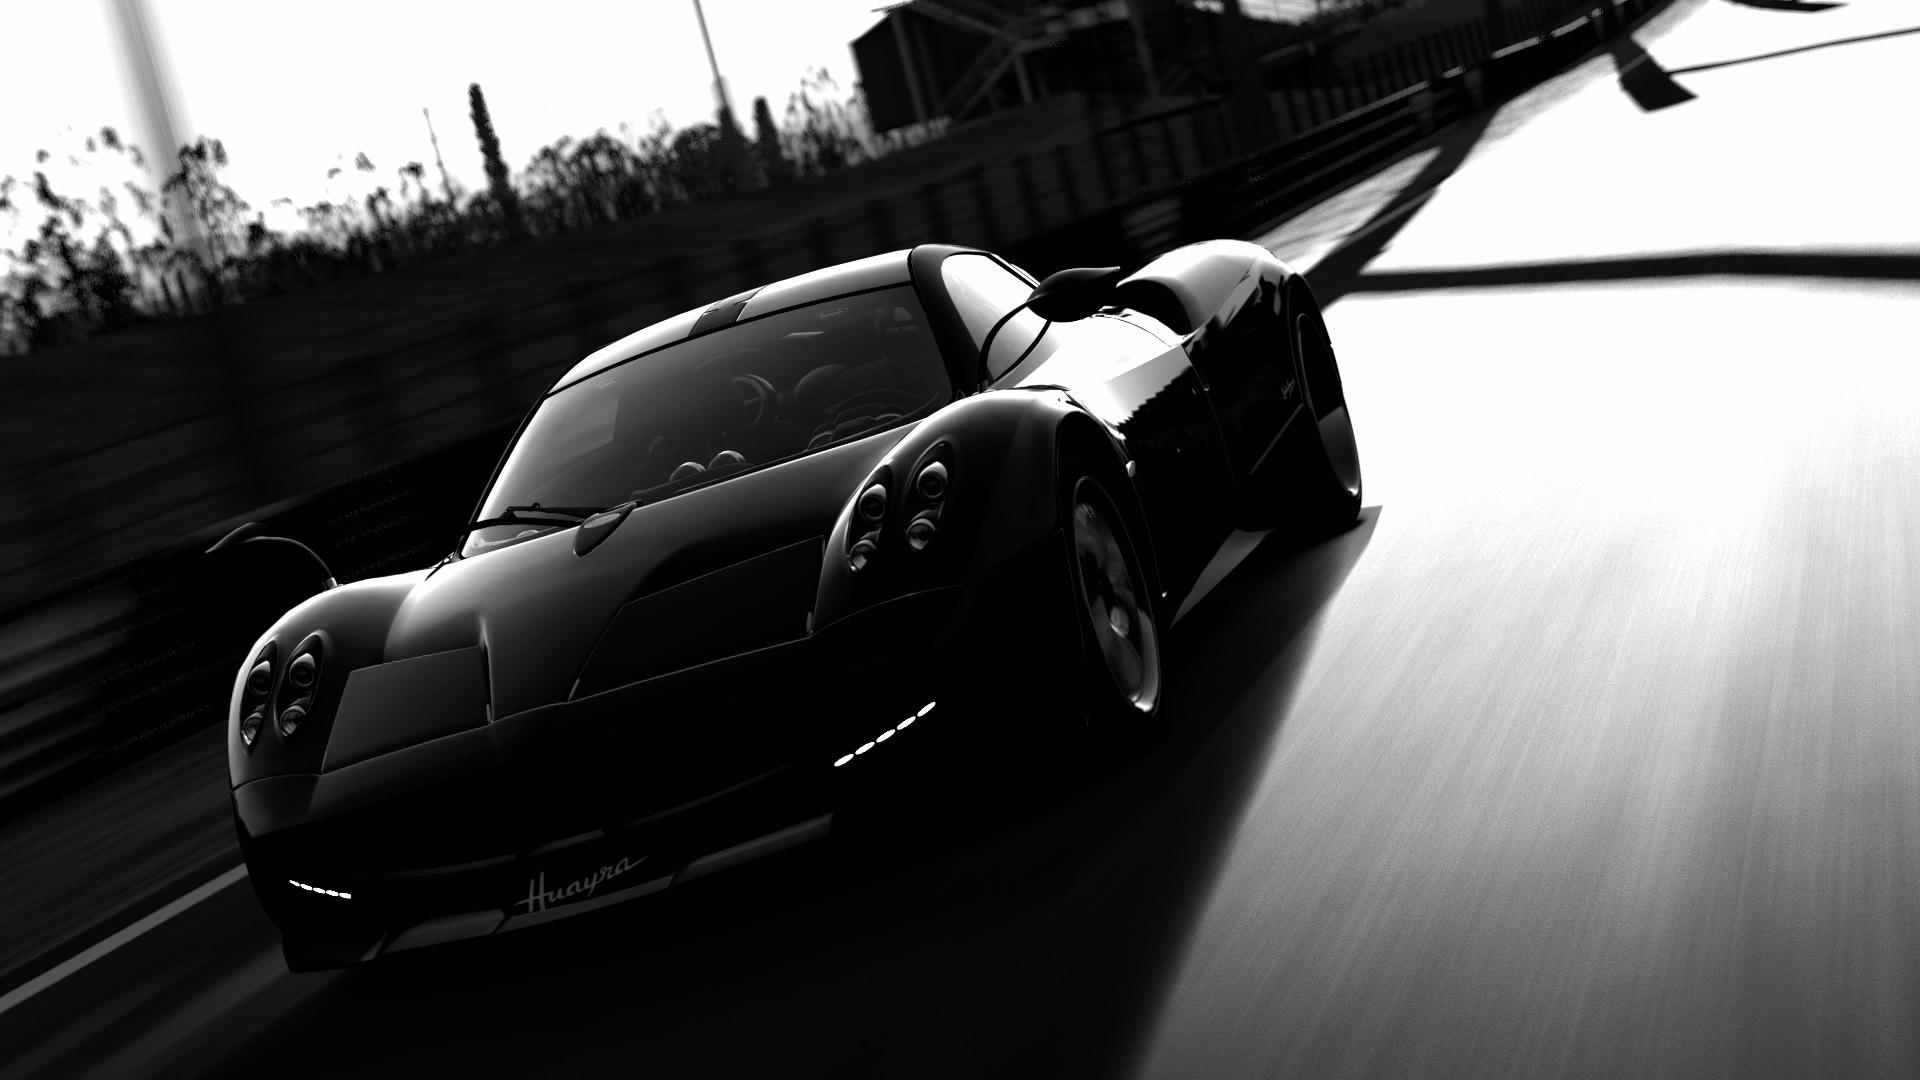 Matte_Black_Pagani_Huayra_hd Interesting Bugatti Veyron Grand Sport Vitesse Vs Pagani Huayra Cars Trend